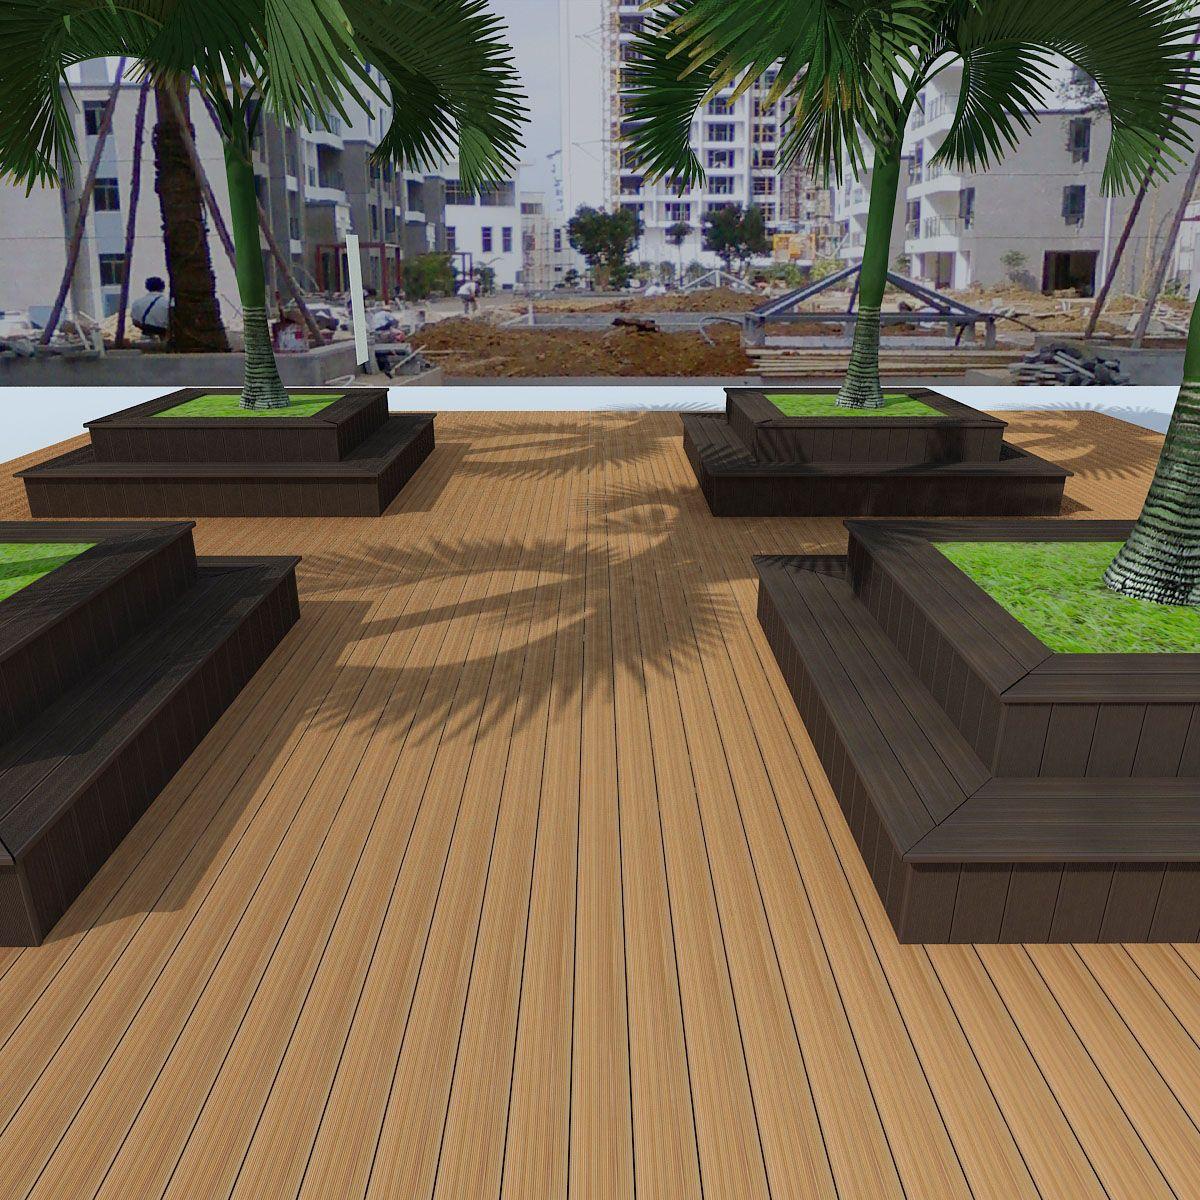 moldova laminate flooring,lowes composite decking on sale